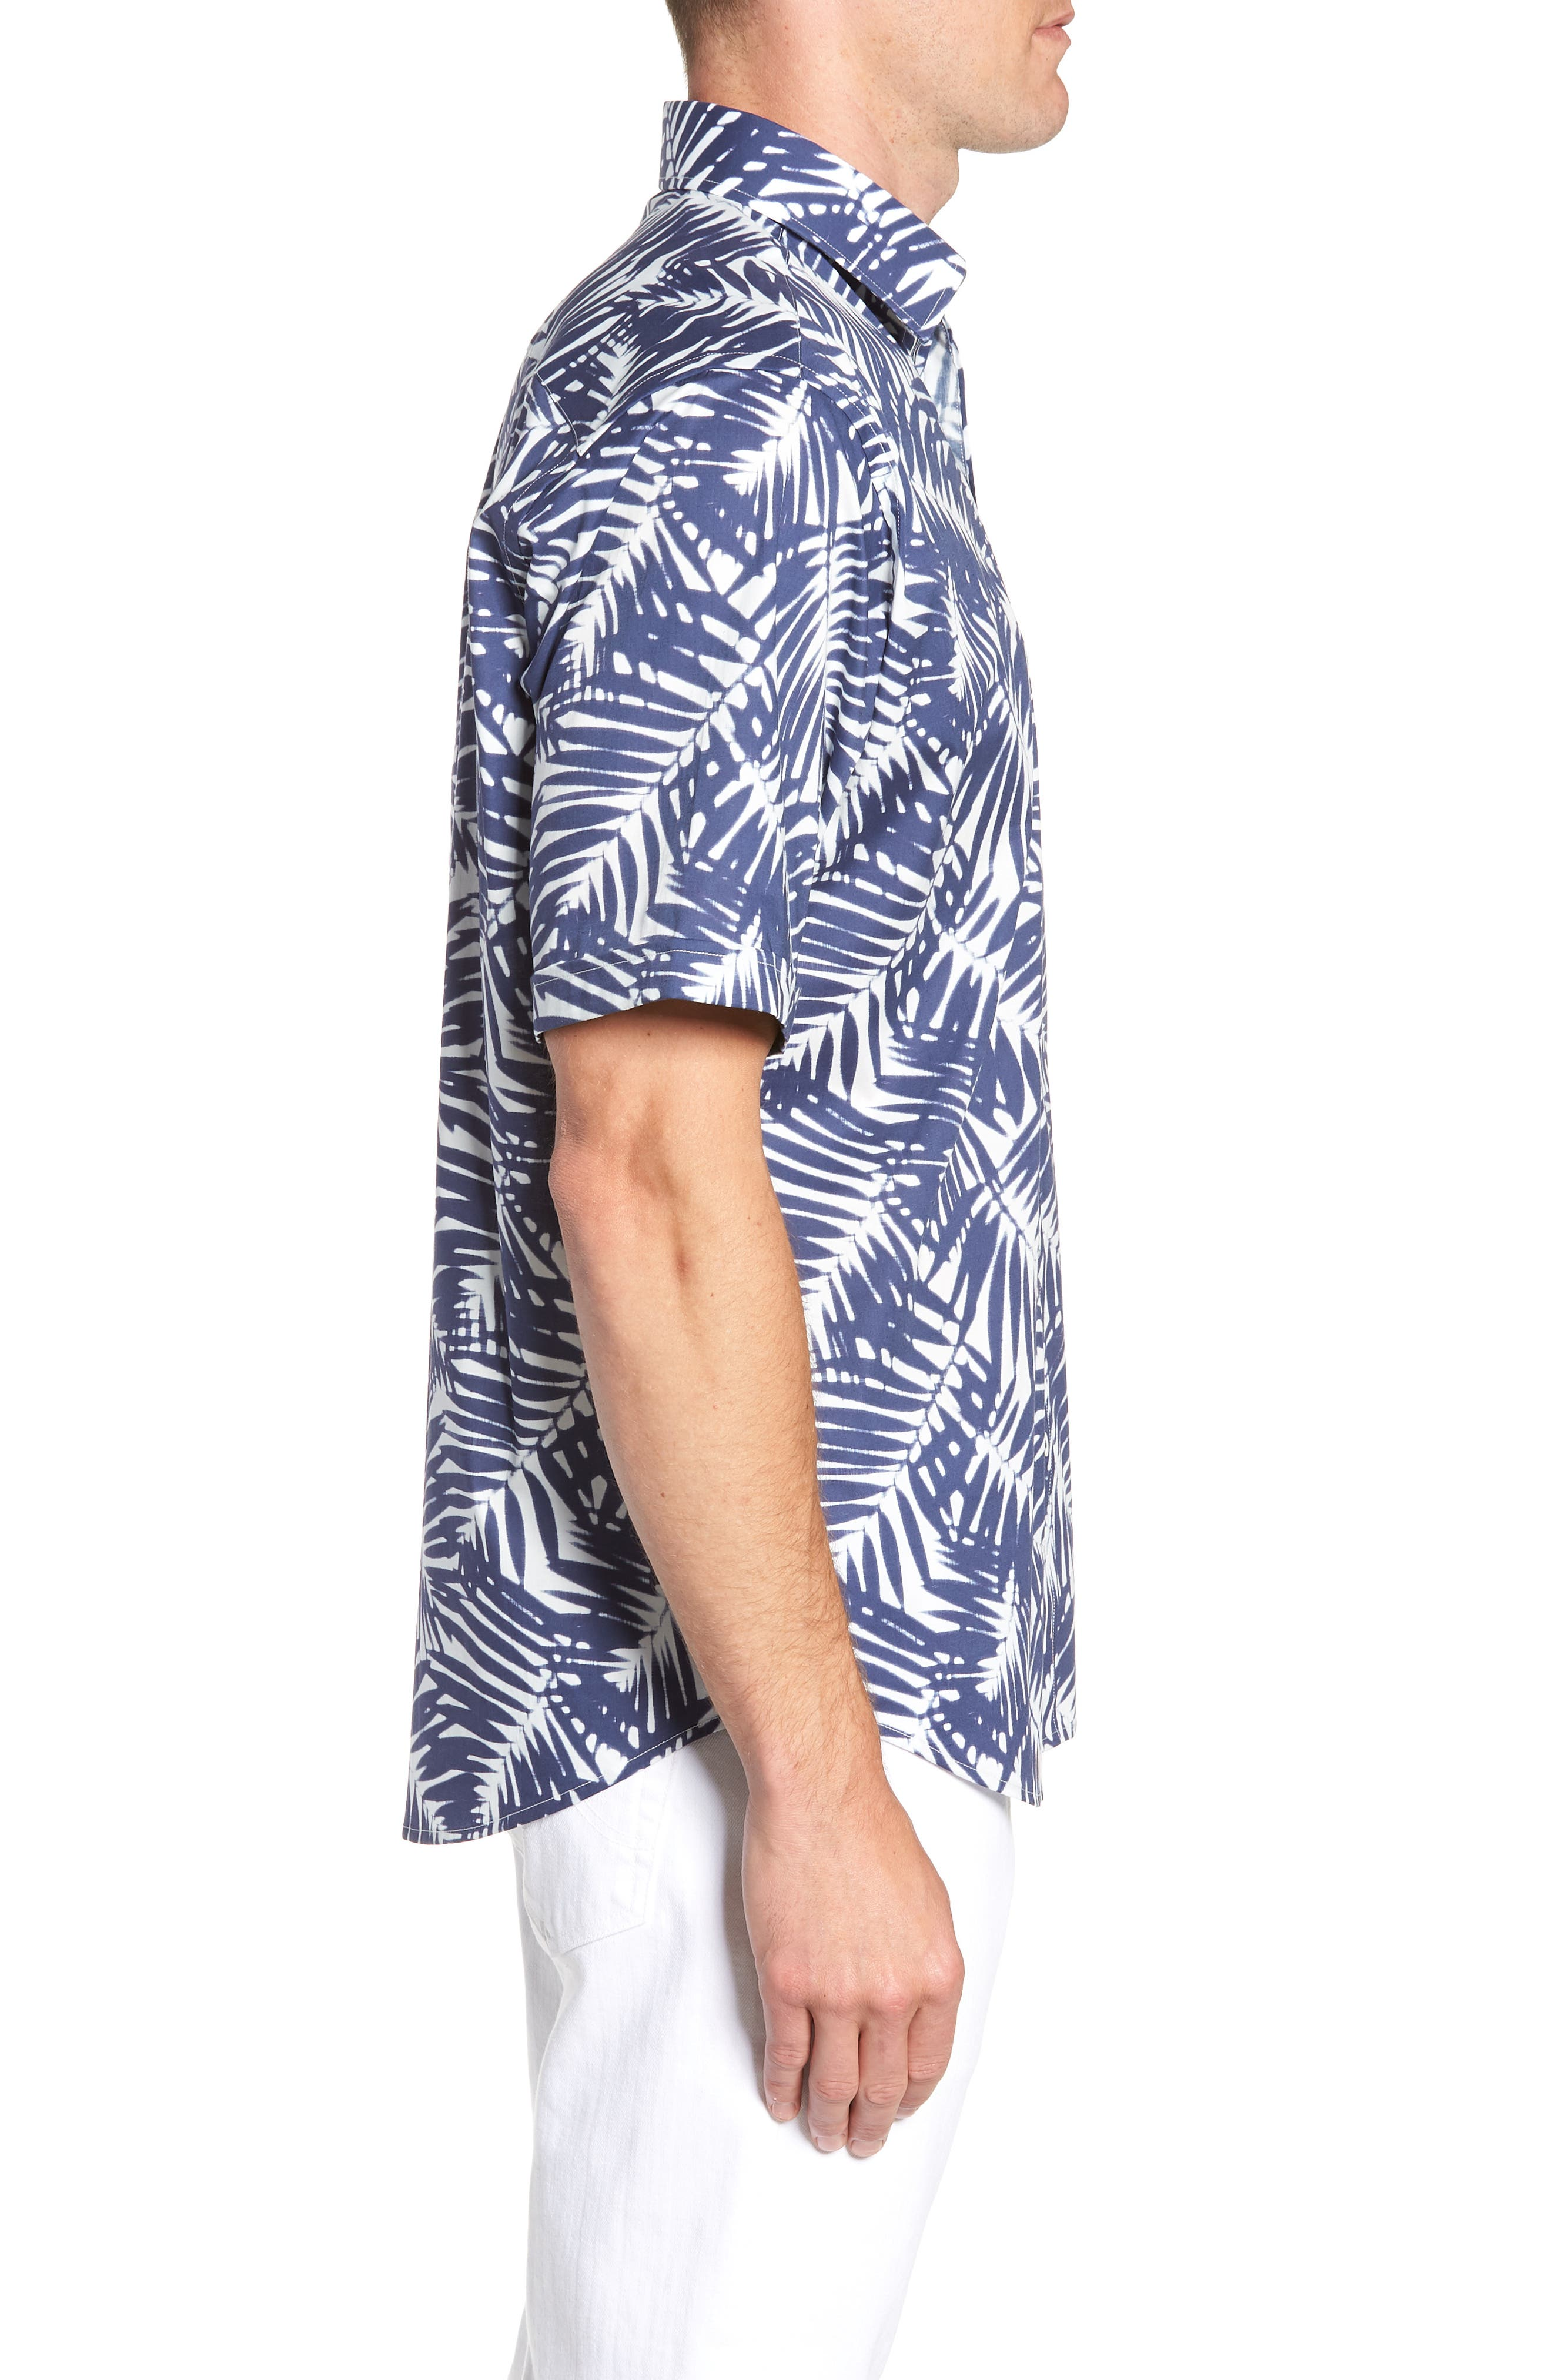 Indigo Palms Classic Fit Sport Shirt,                             Alternate thumbnail 4, color,                             NAVY